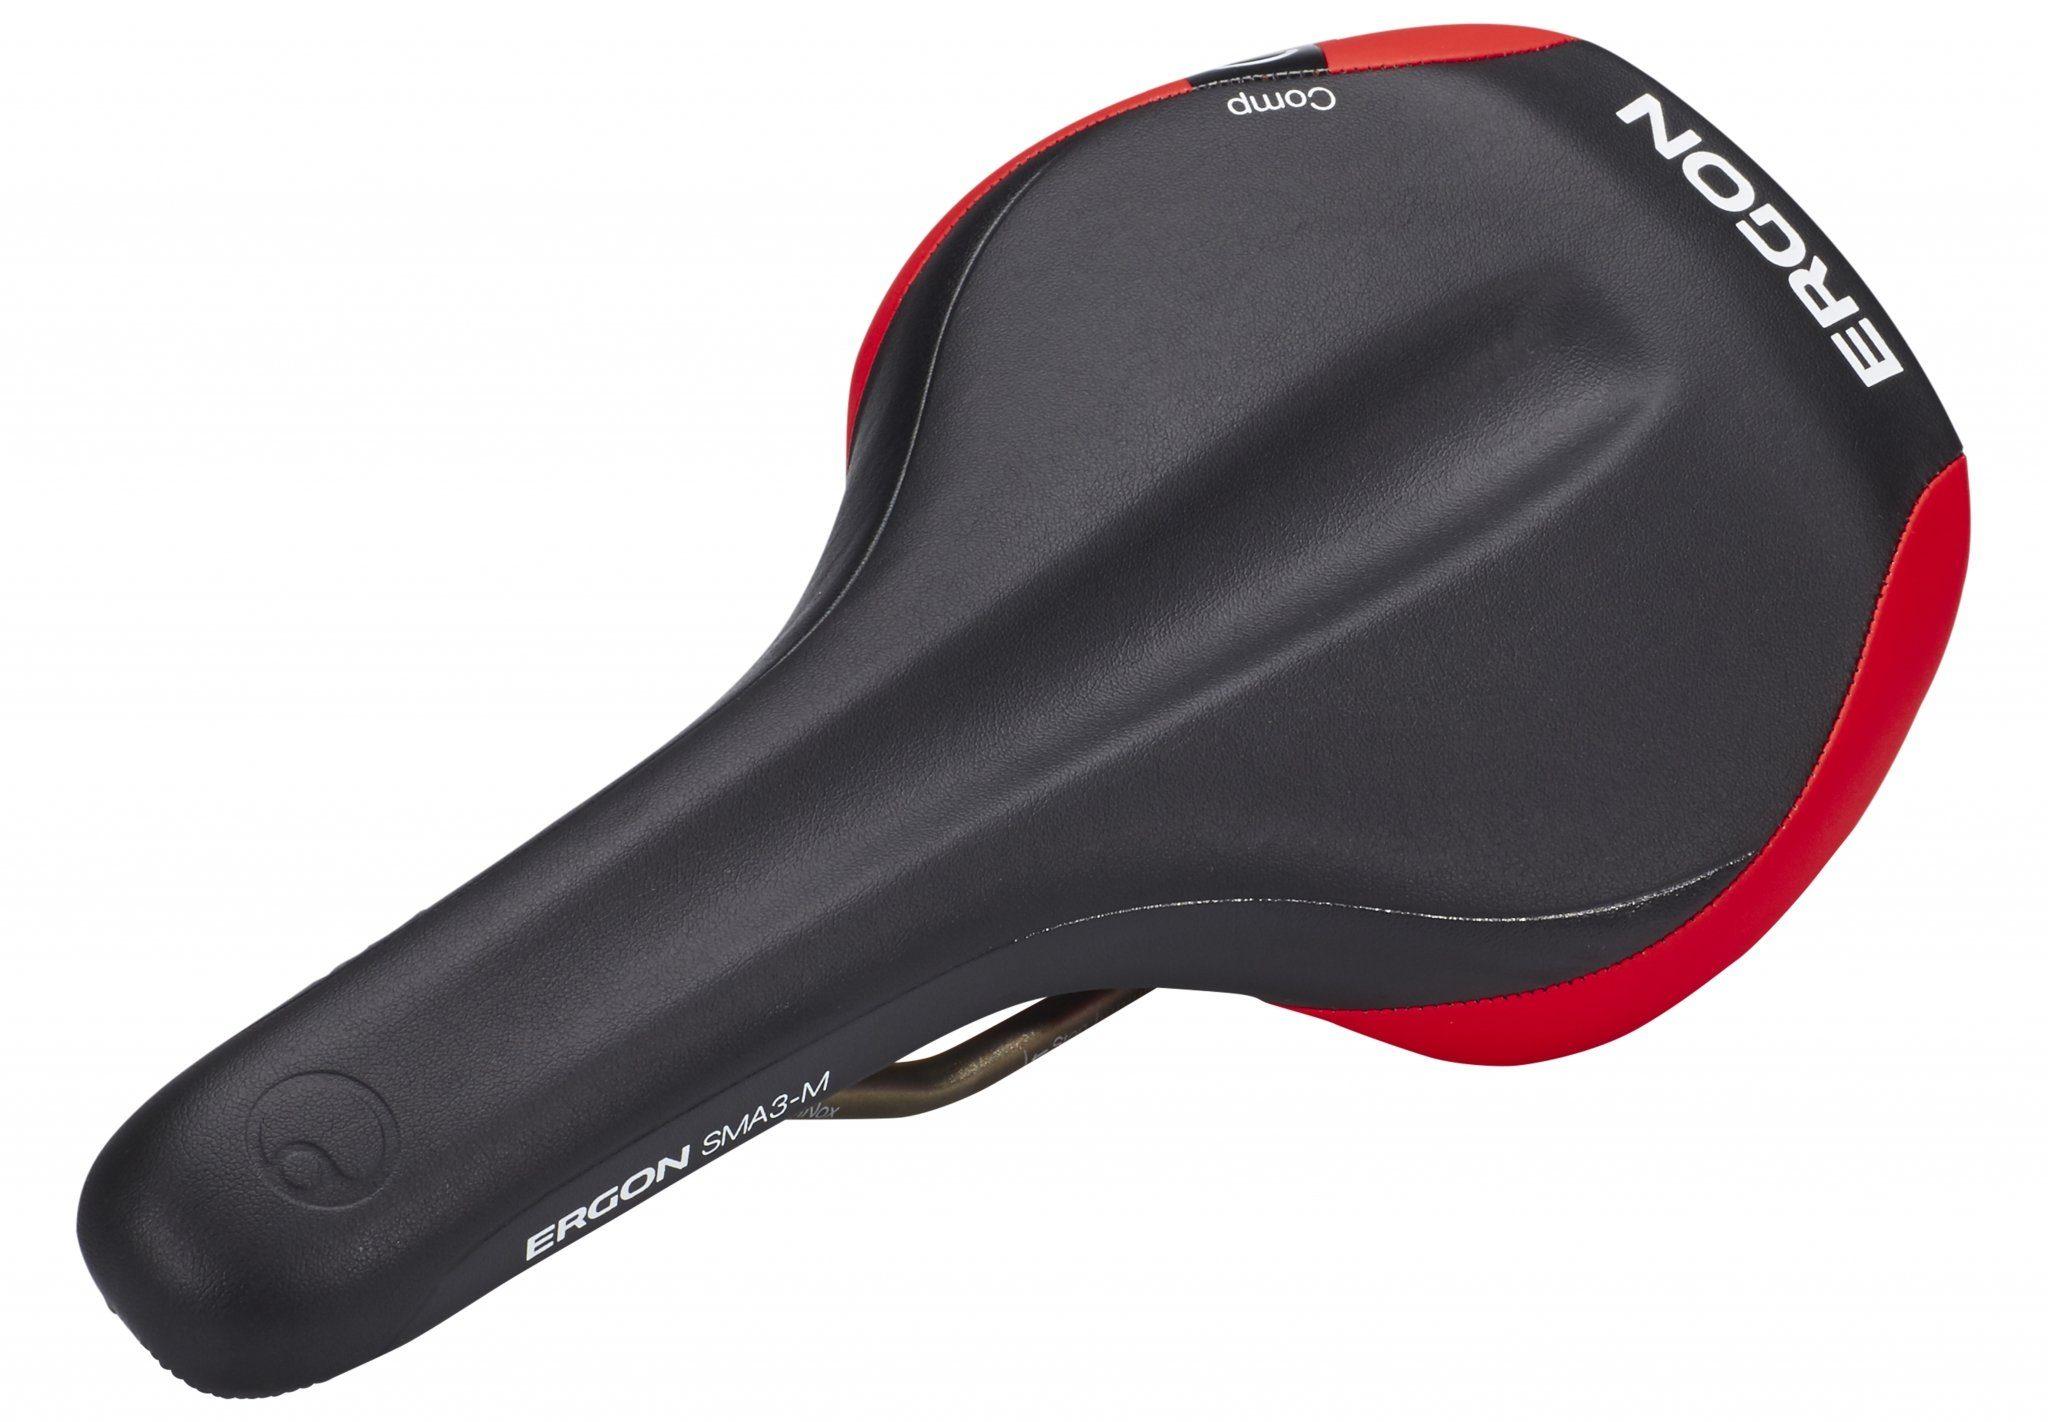 Ergon Fahrradsattel »SMA3-M Sattel Comp«